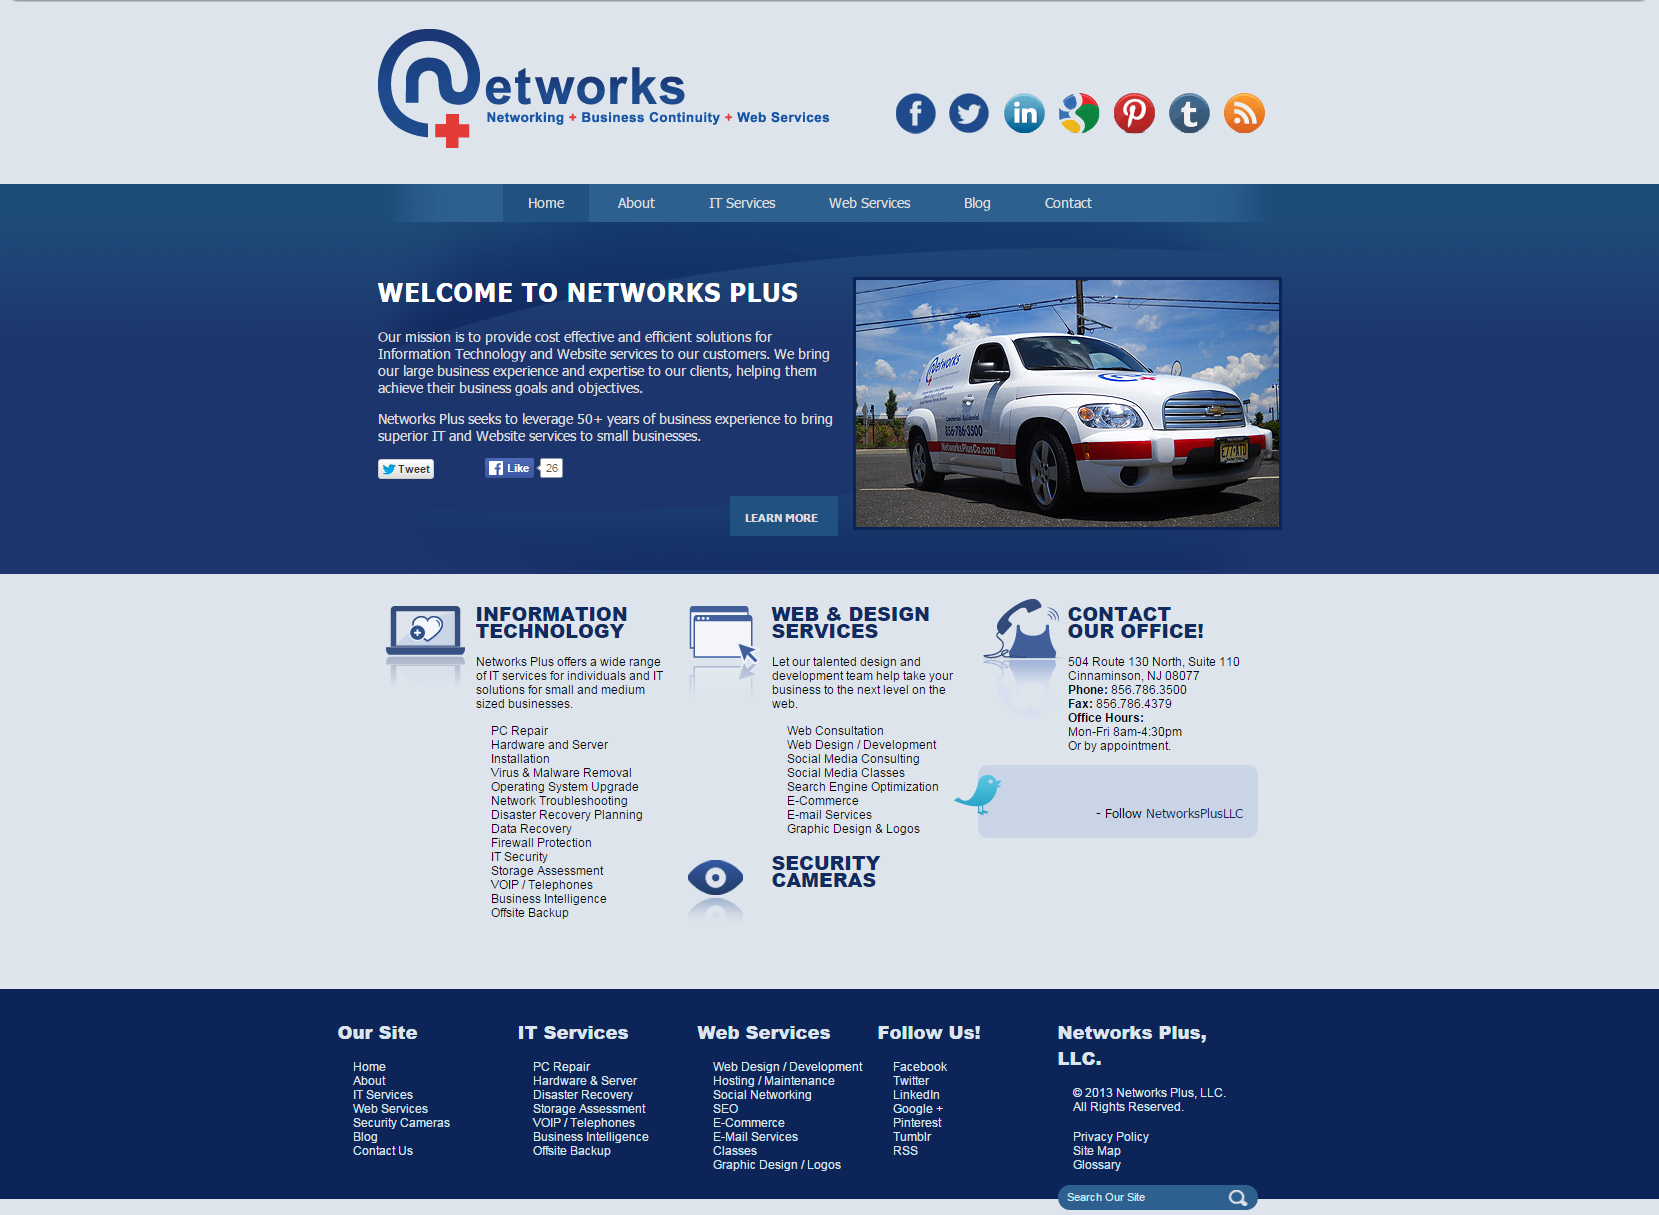 1Networks Plus